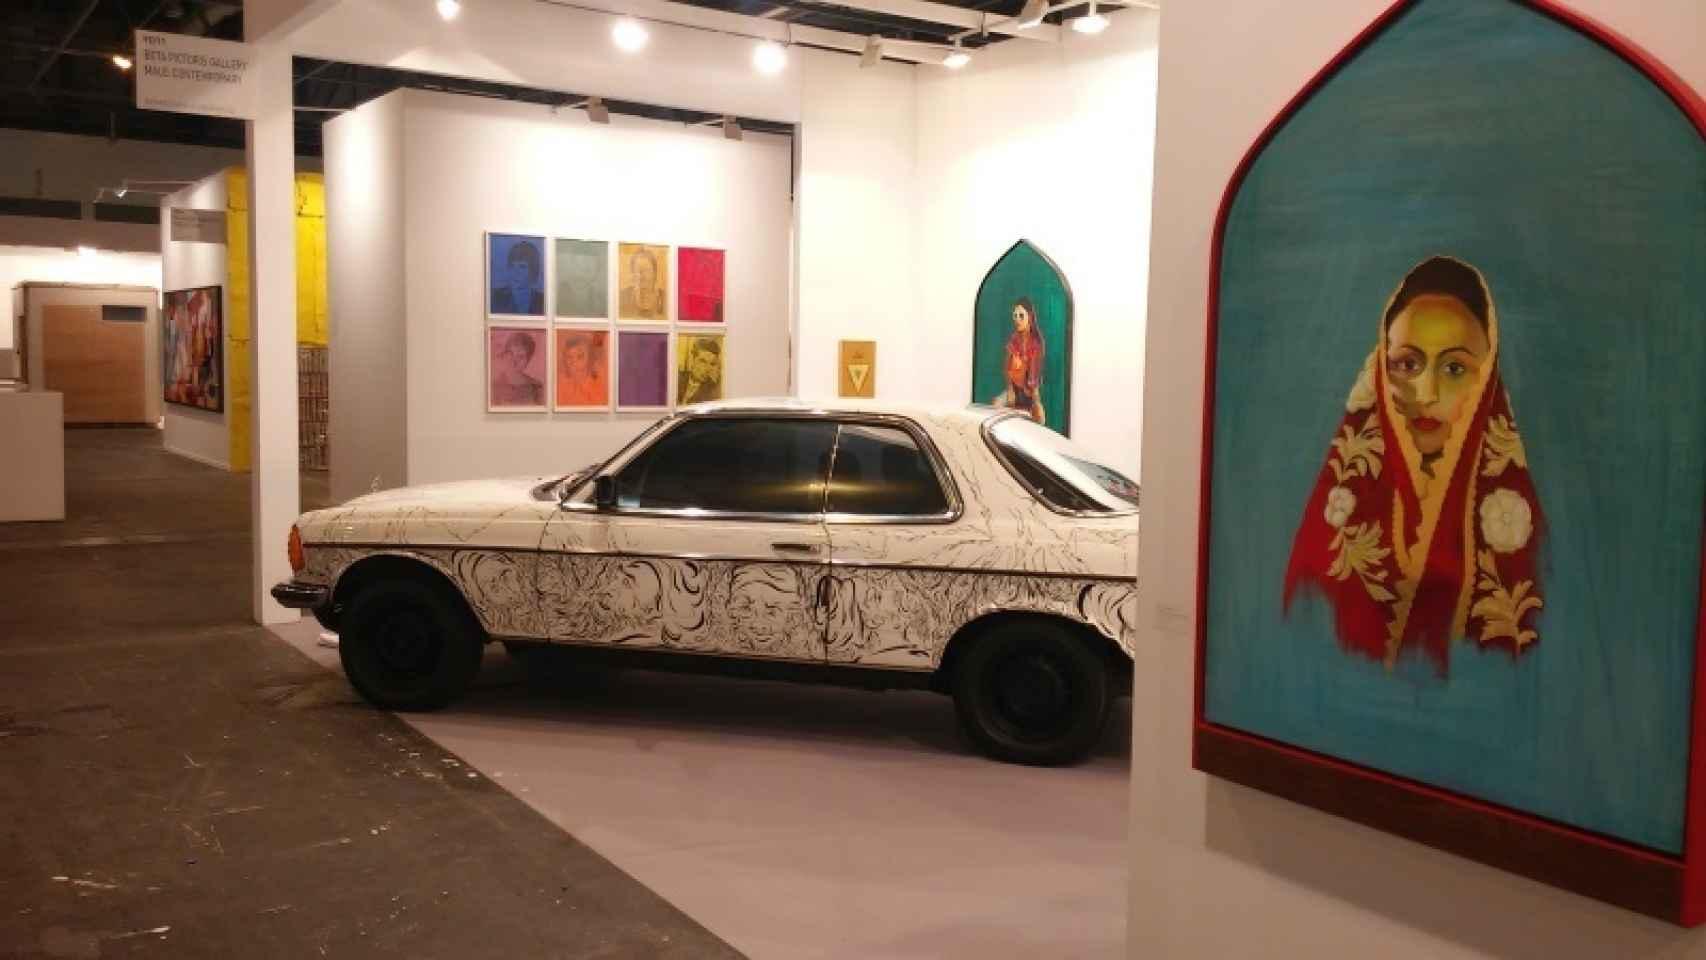 Taravat Talepasand y su pieza Dar Bast (Closed Door) 1977 Mercedes 230 Coupé.